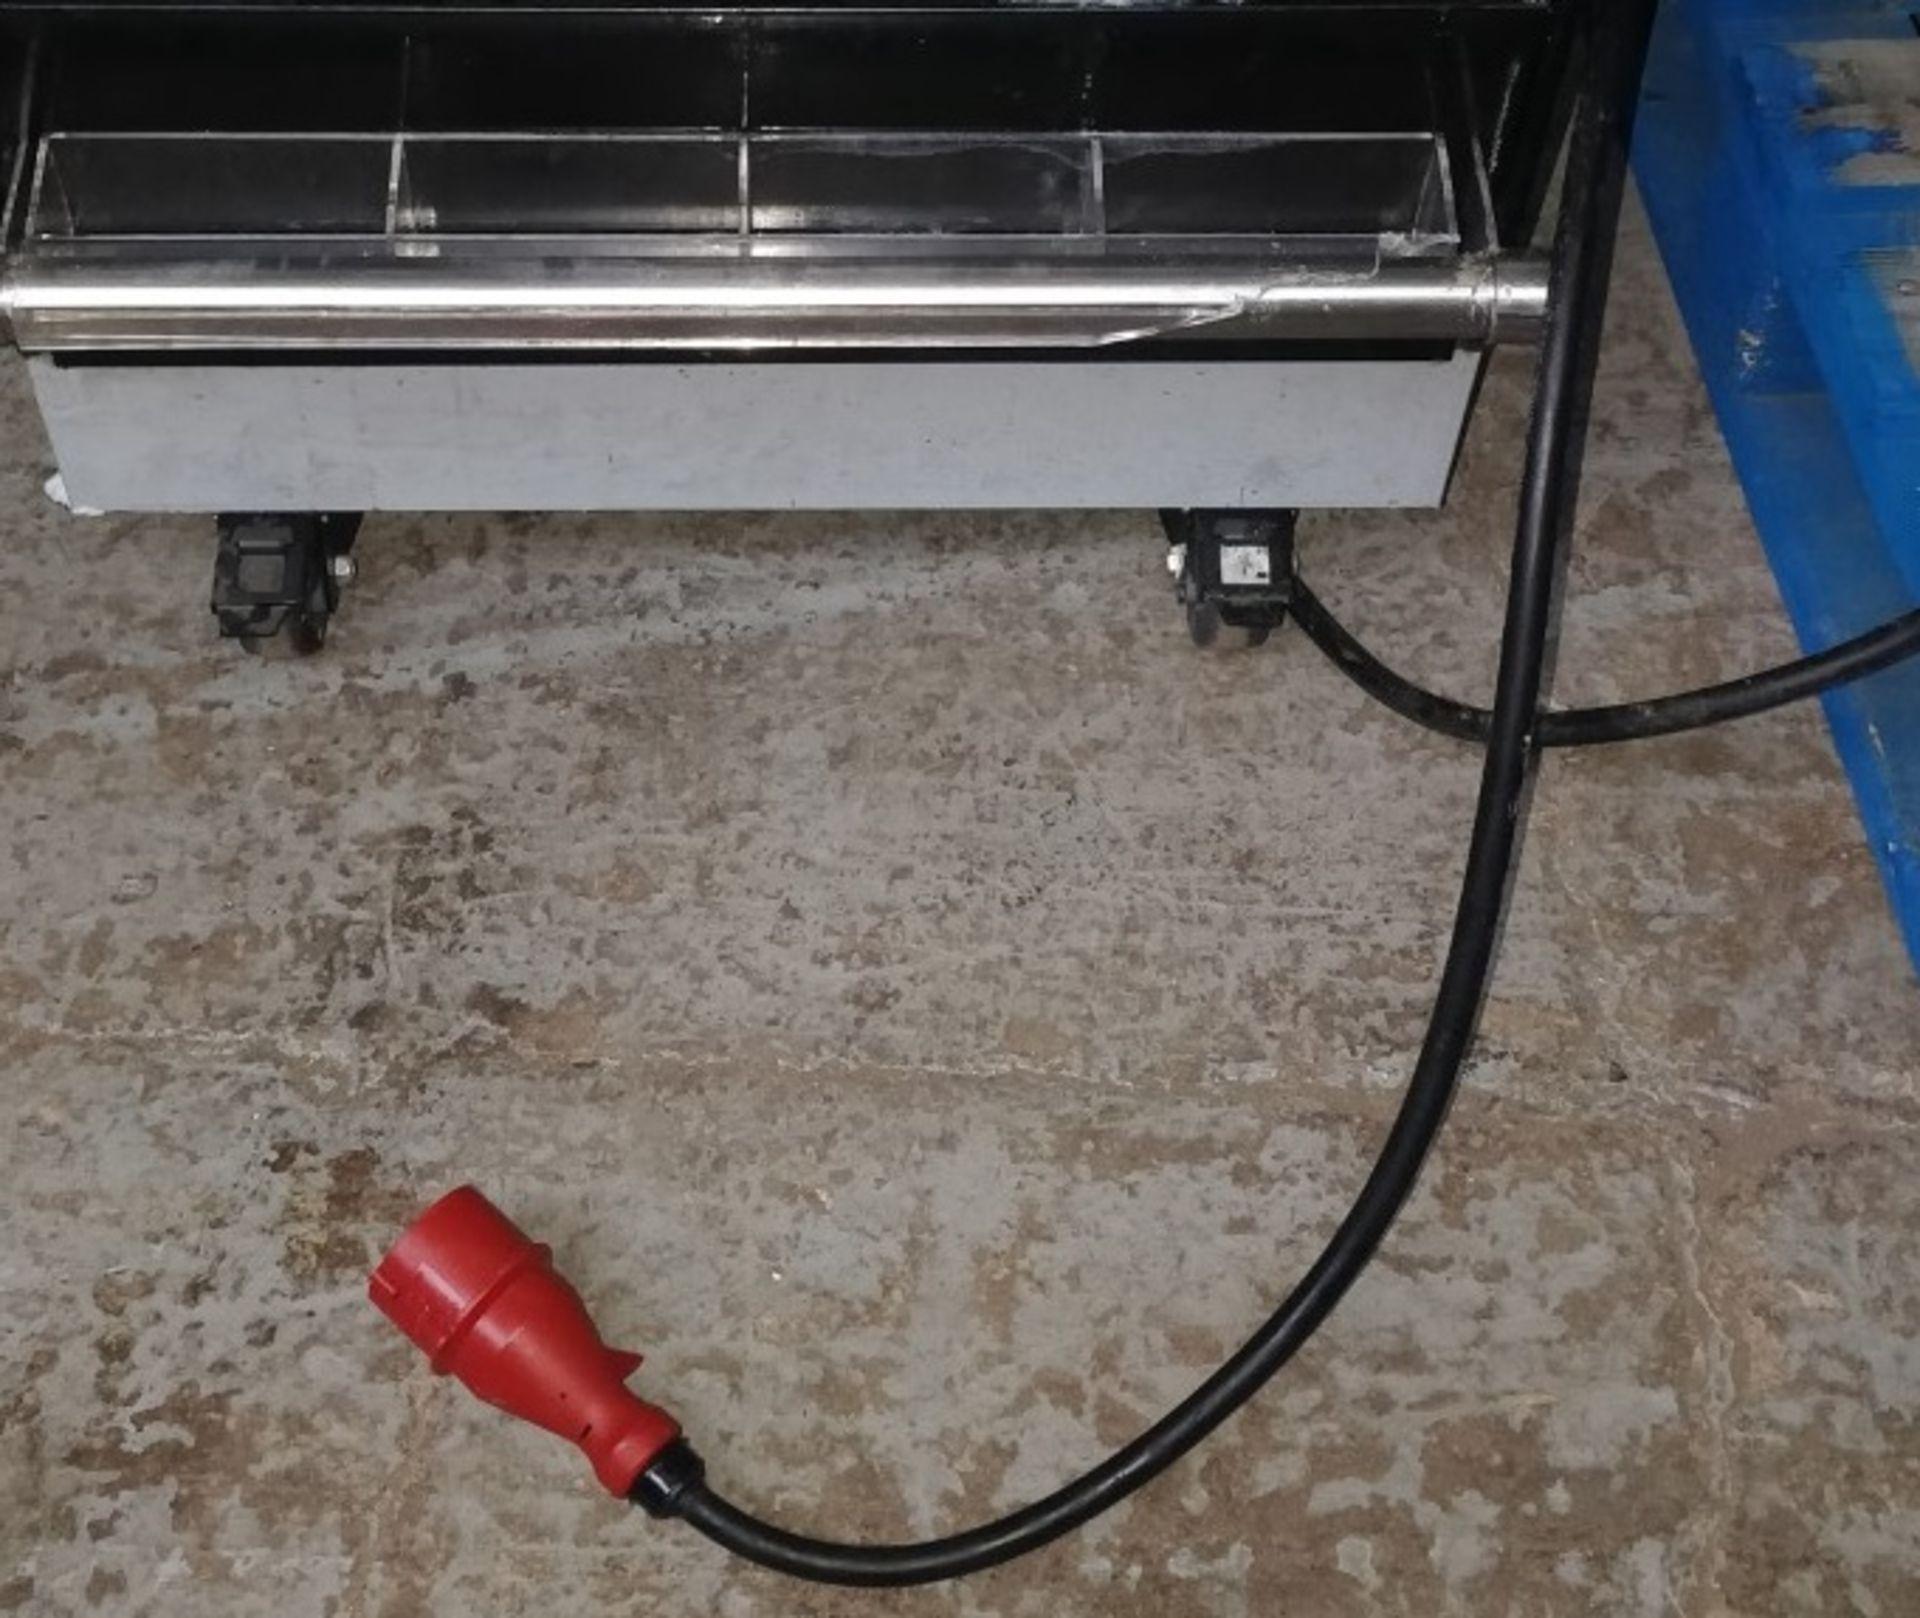 1 x Frijado Multi Deck 60 5 Level Heated Grab and Go Display Warmer - 400v 3 Phase - H197 x W60 x - Image 4 of 11